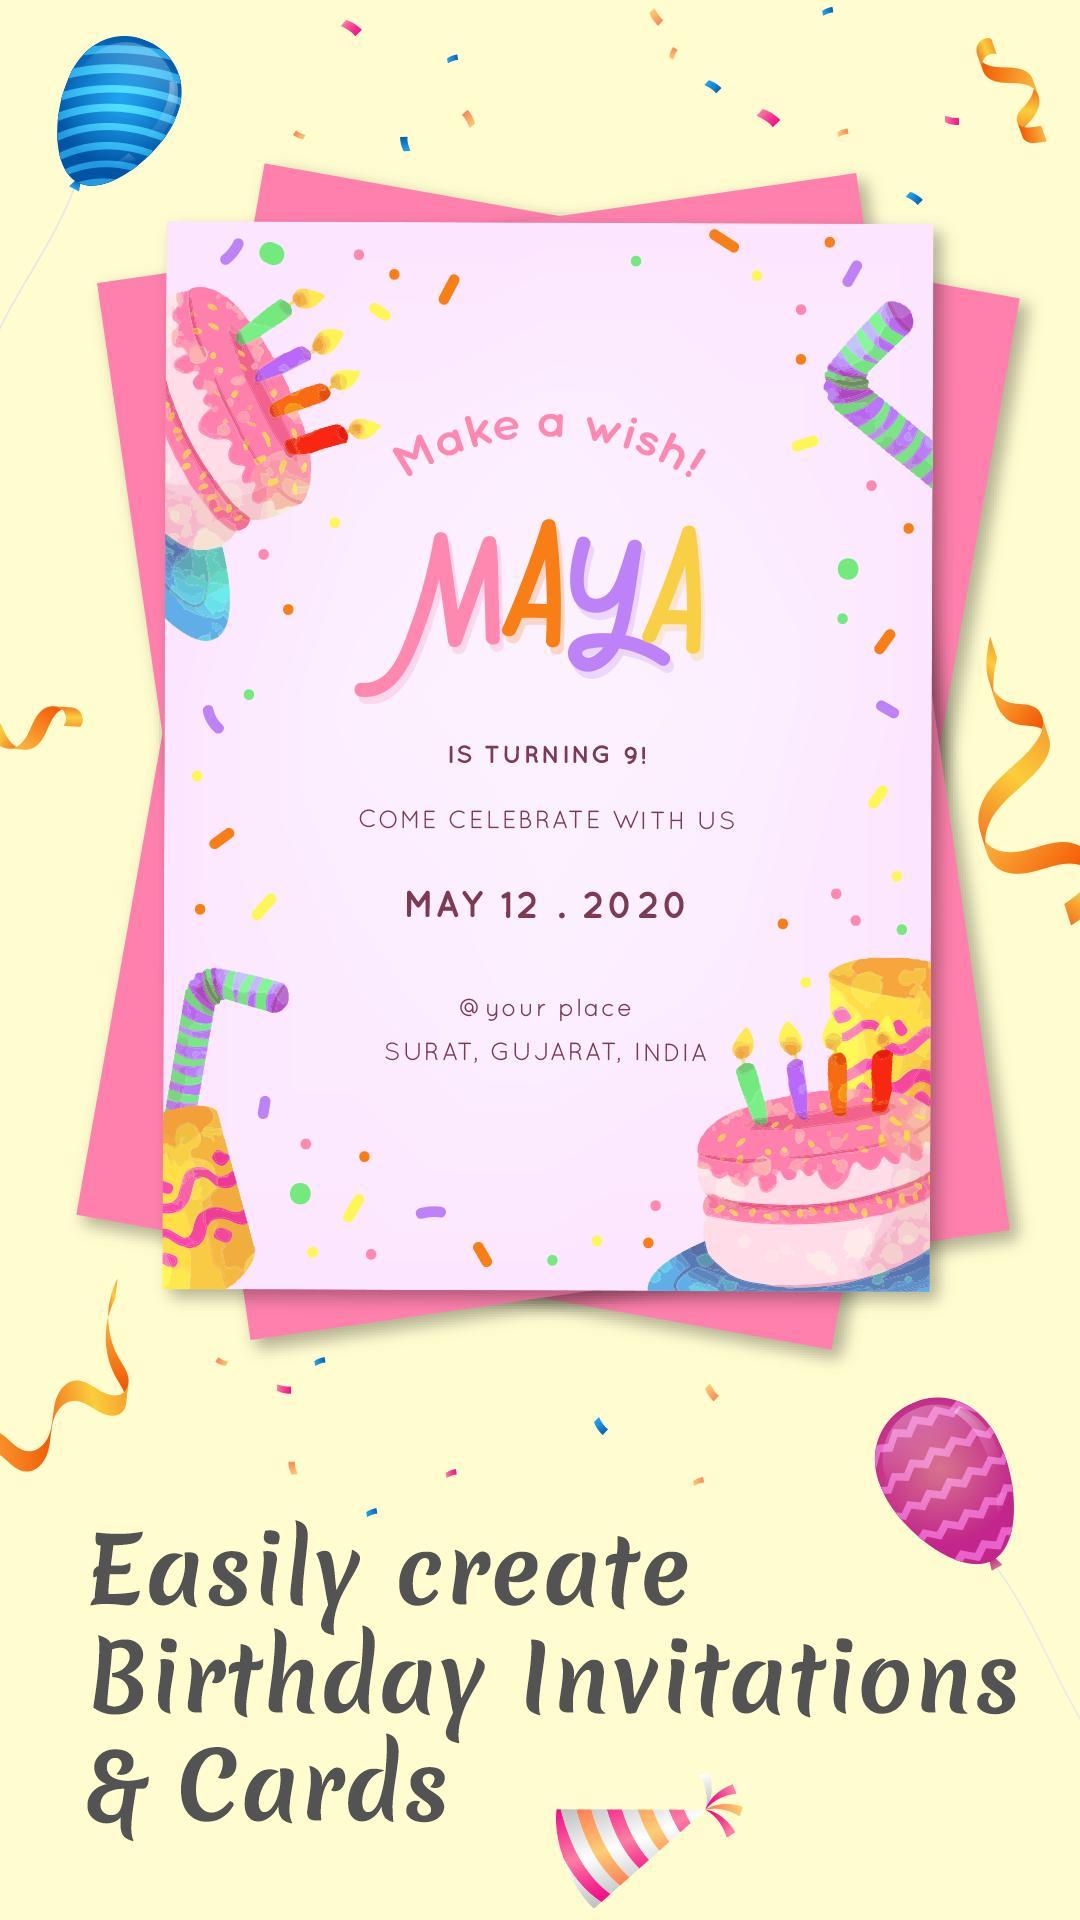 Birthday Invitation Card Maker Invitation Maker For Android Apk Download